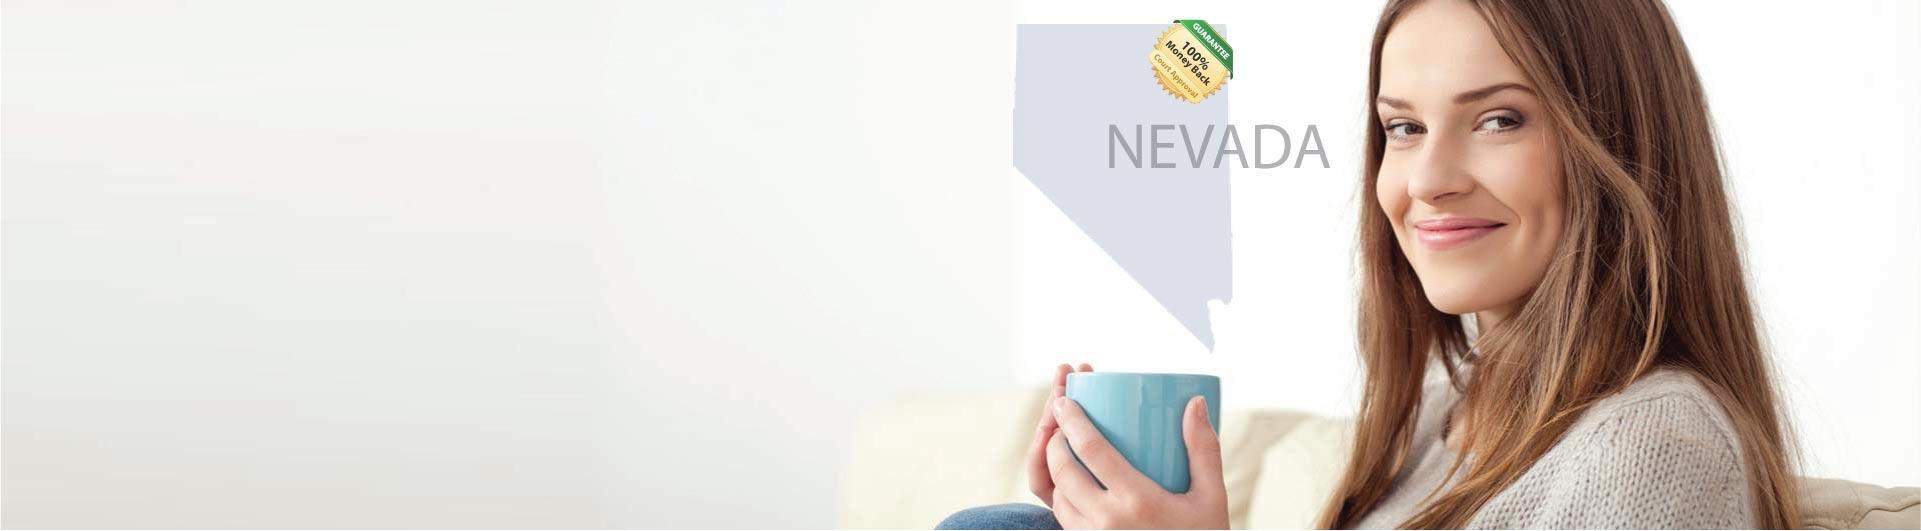 Carson City Nevada Divorce Forms